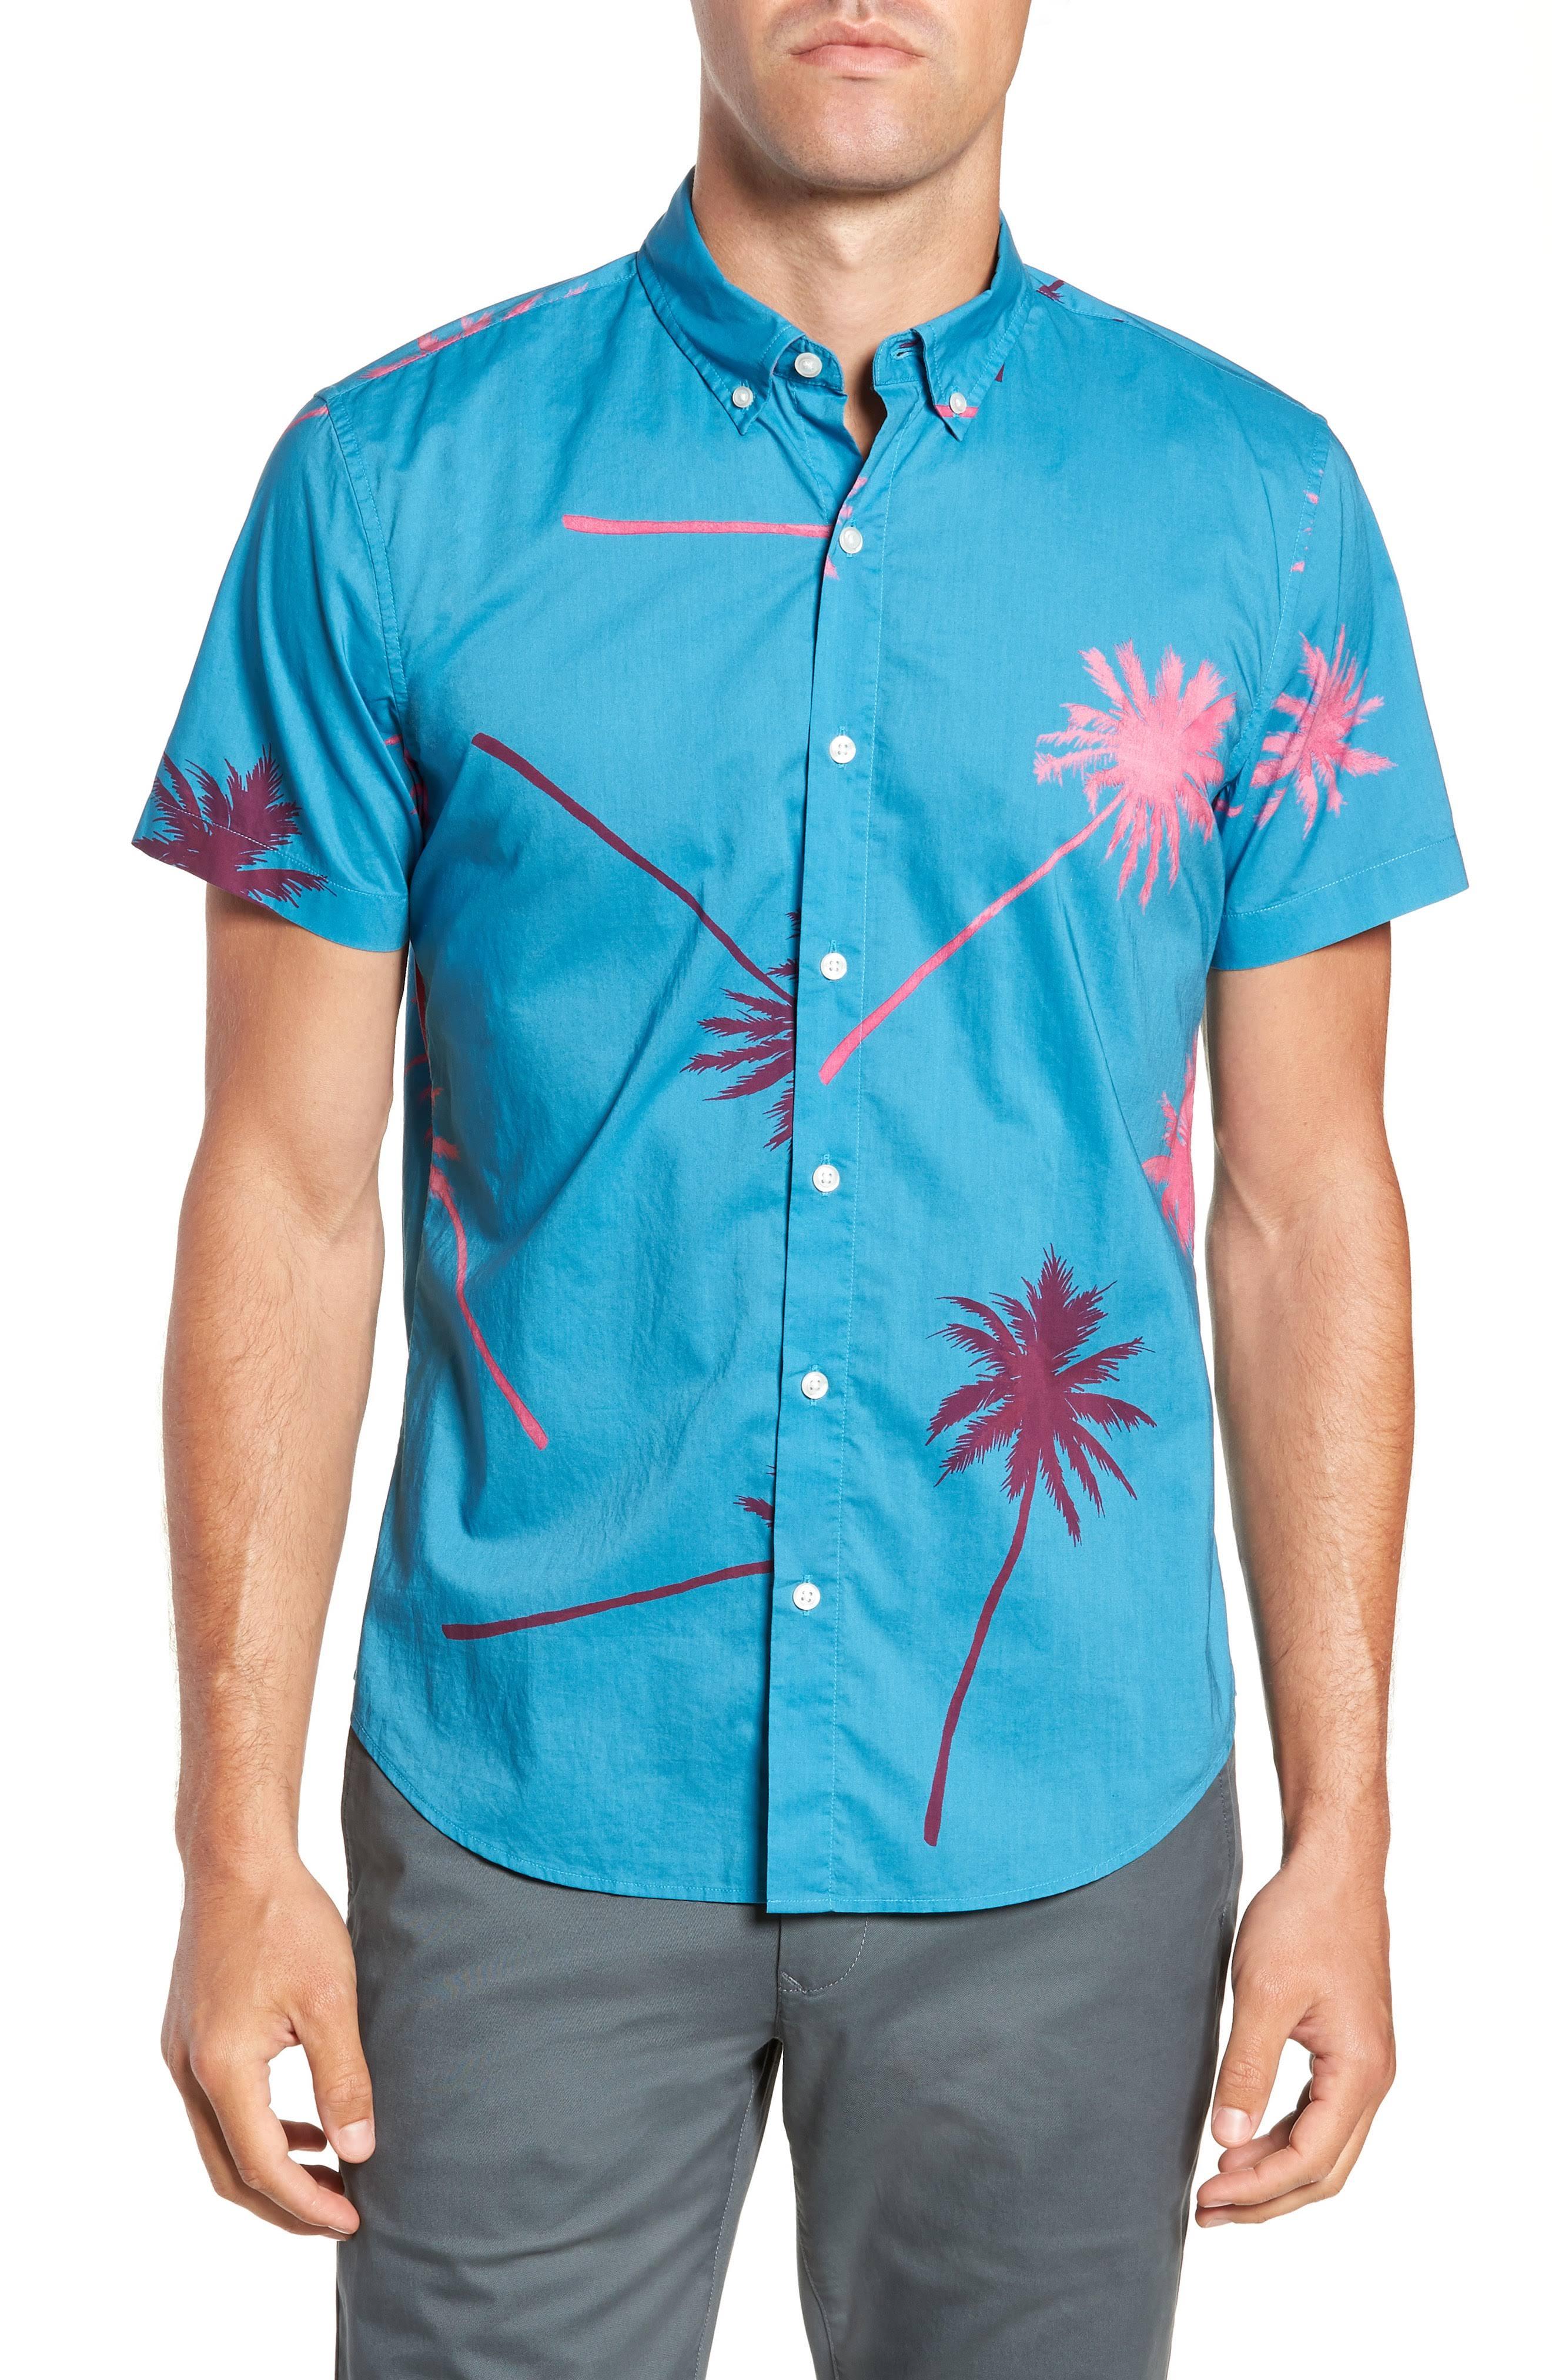 Surf Blue Corta Mxreg Casual Camisa Riviera Bonobos Paradise Slim Para Manga De Hombre xap61